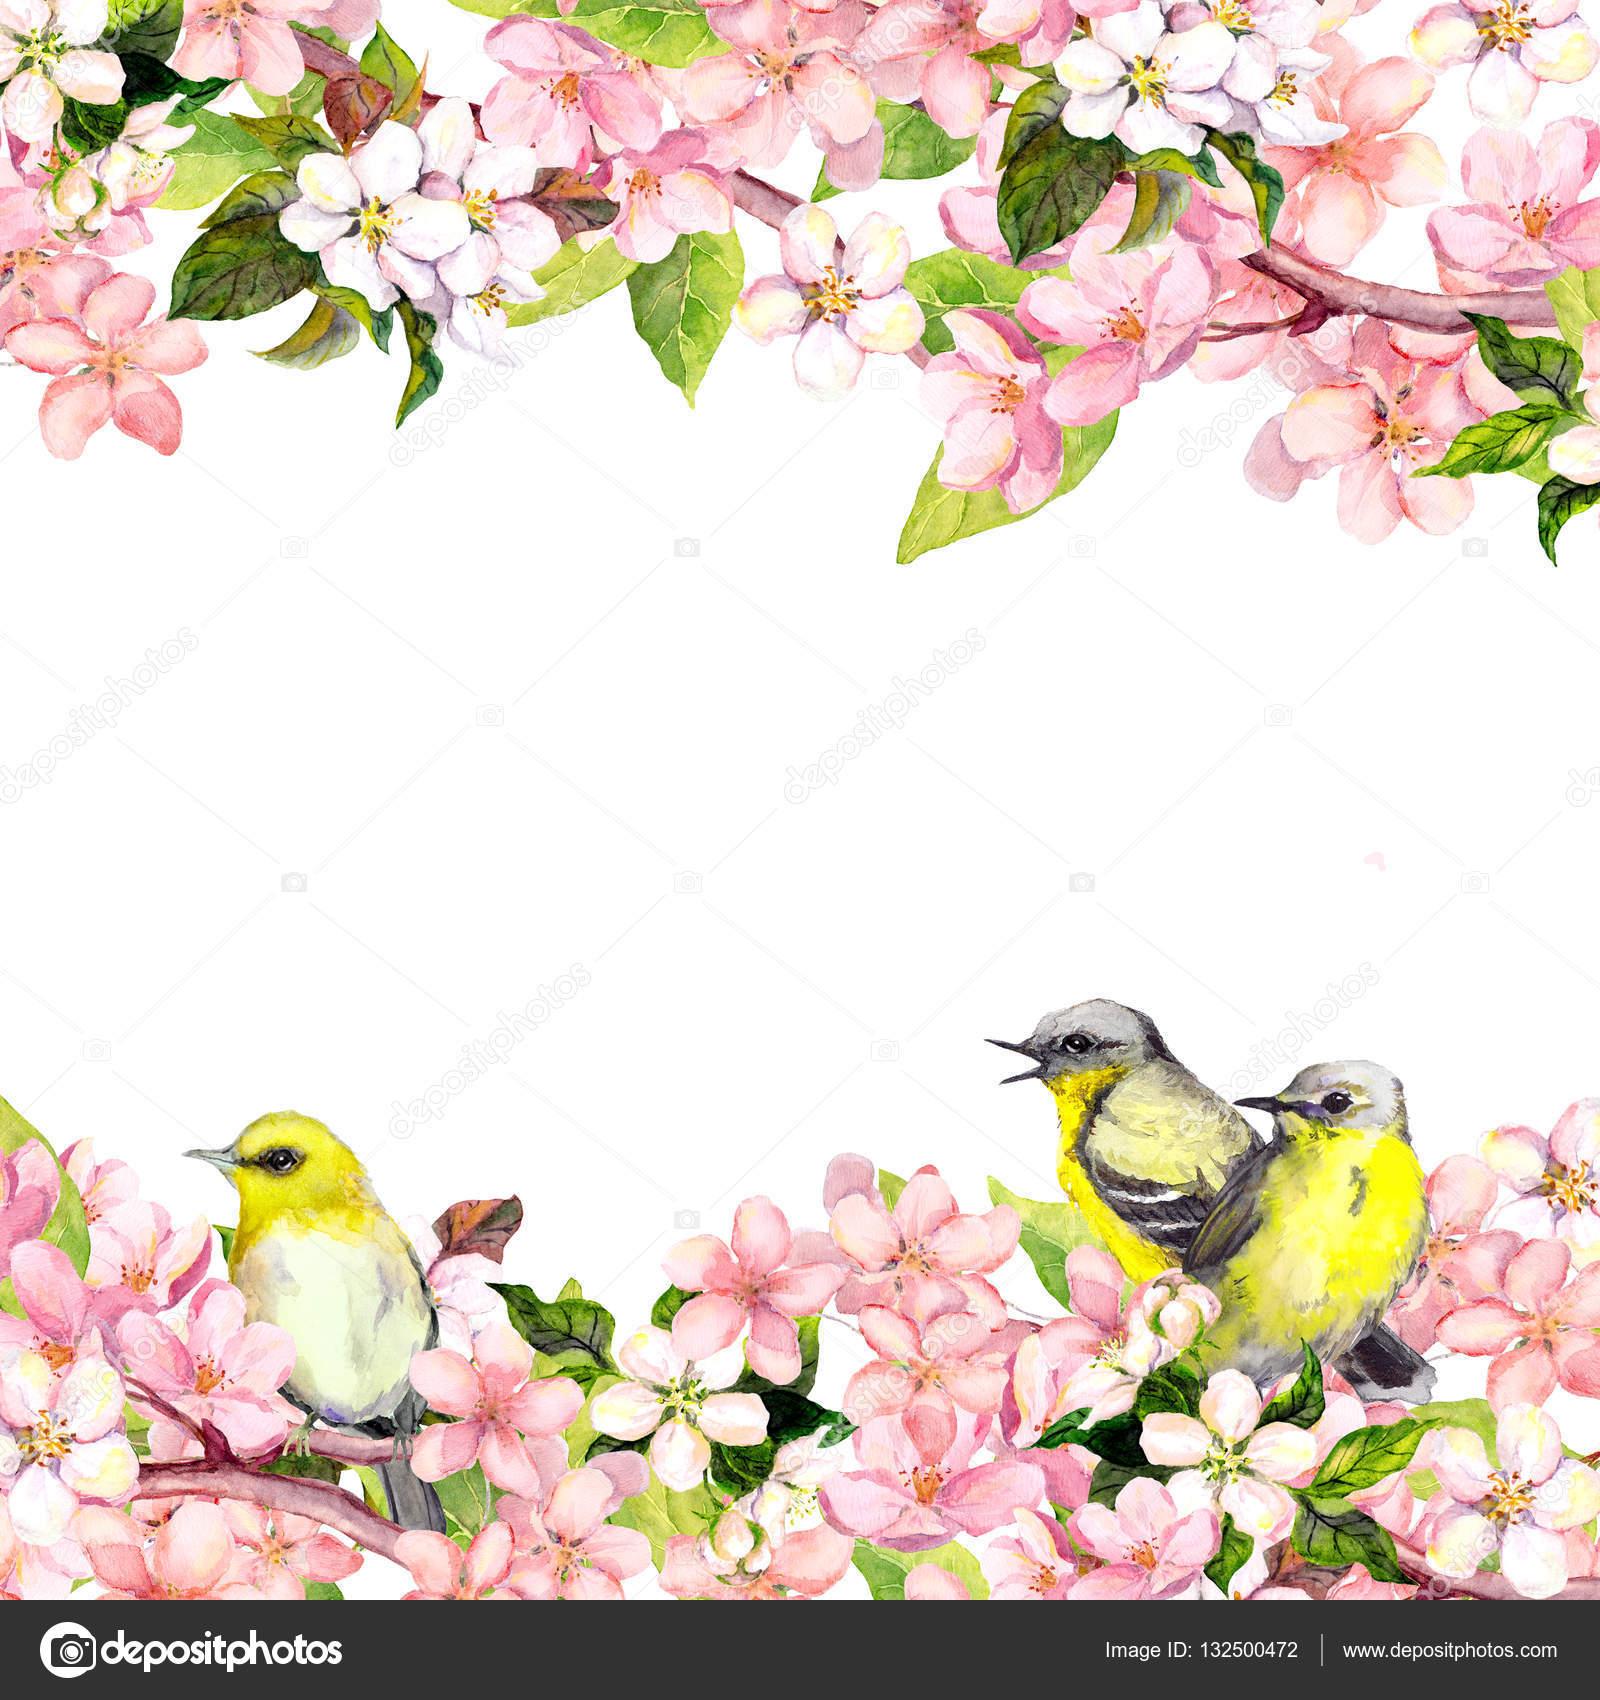 Blossom pink sakura flowers and song birds floral card or blank blossom of pink sakura flowers and song birds floral card or blank watercolor photo by zzzorikk mightylinksfo